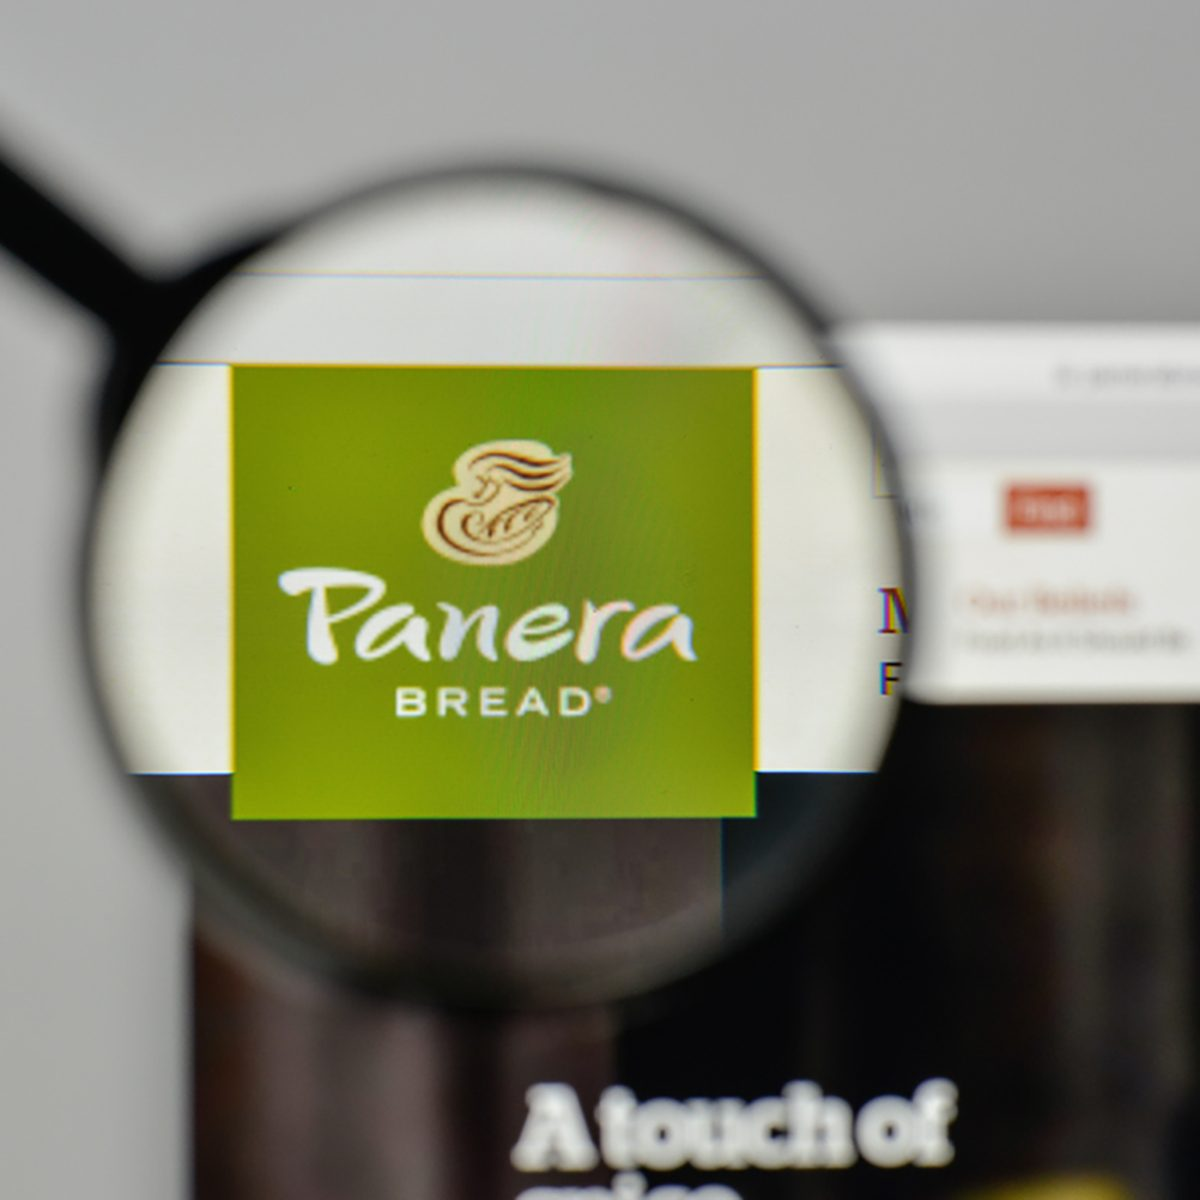 Panera Bread logo on the website homepage